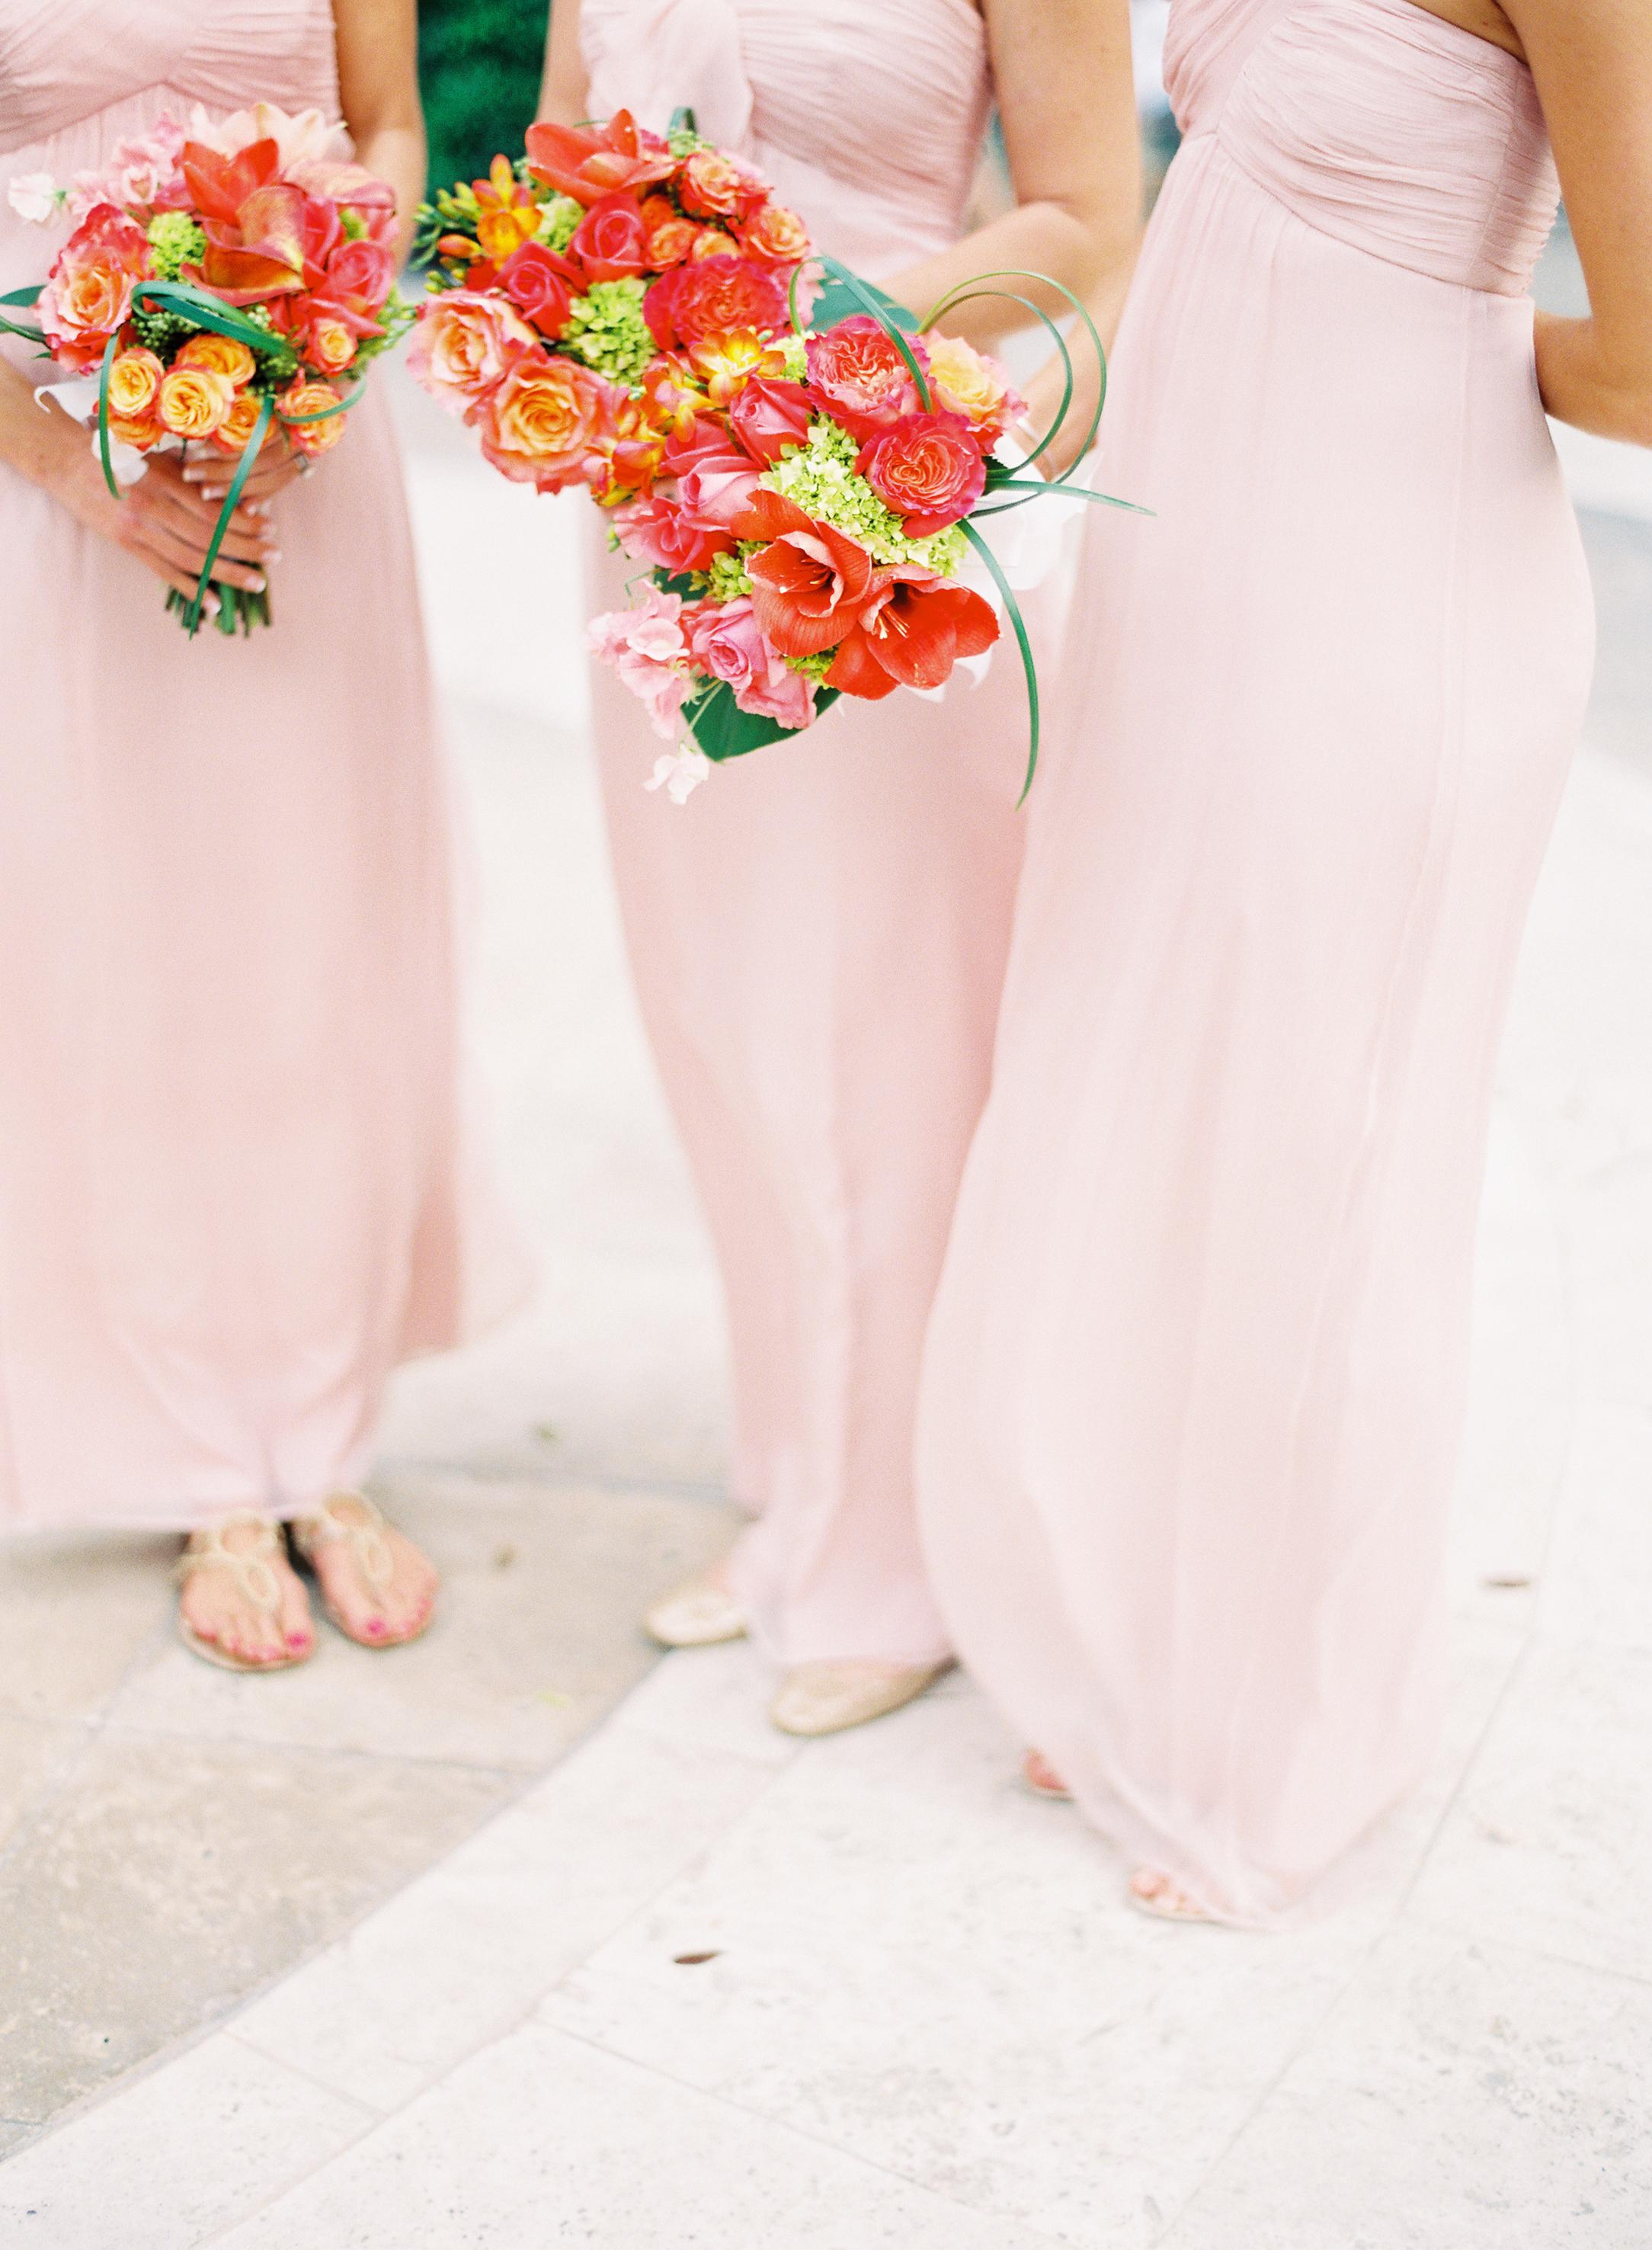 Bridesmaids, Bridesmaids Dresses, Fashion, pink, Bouquet, Lilies, Amsale, Coral, Blush, Karina mike